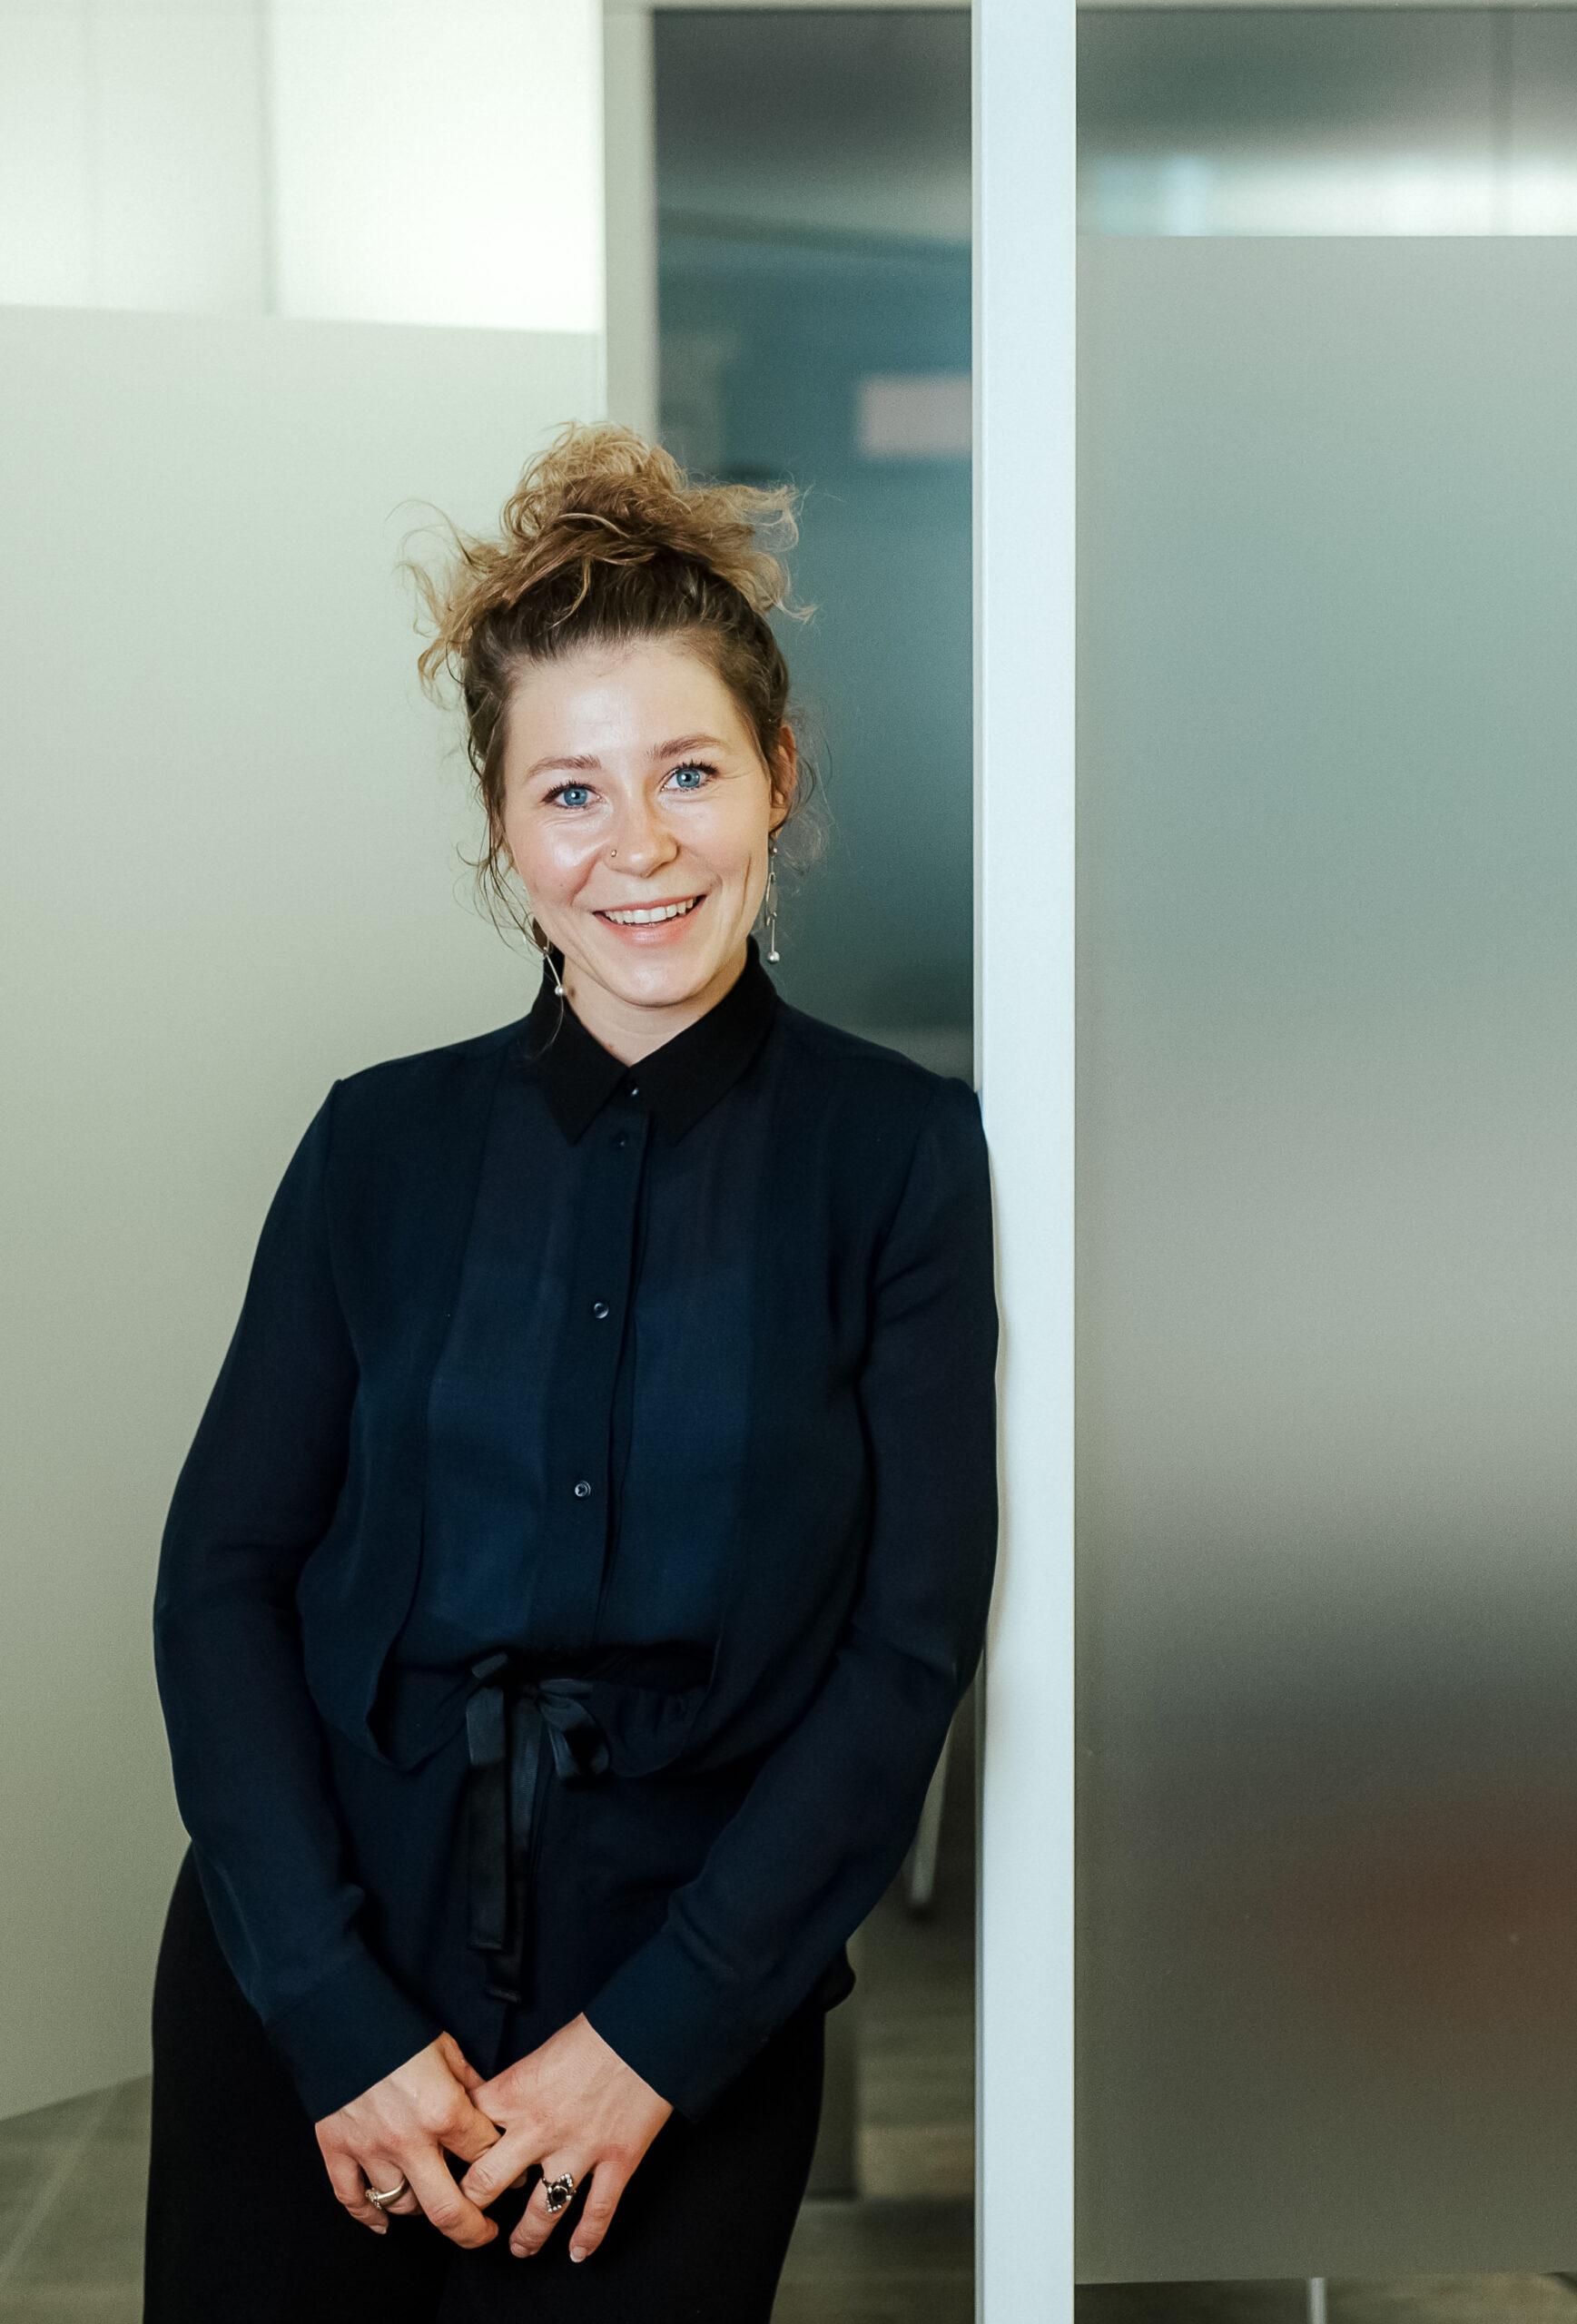 Hannah Lea Dykast-Wildhaber